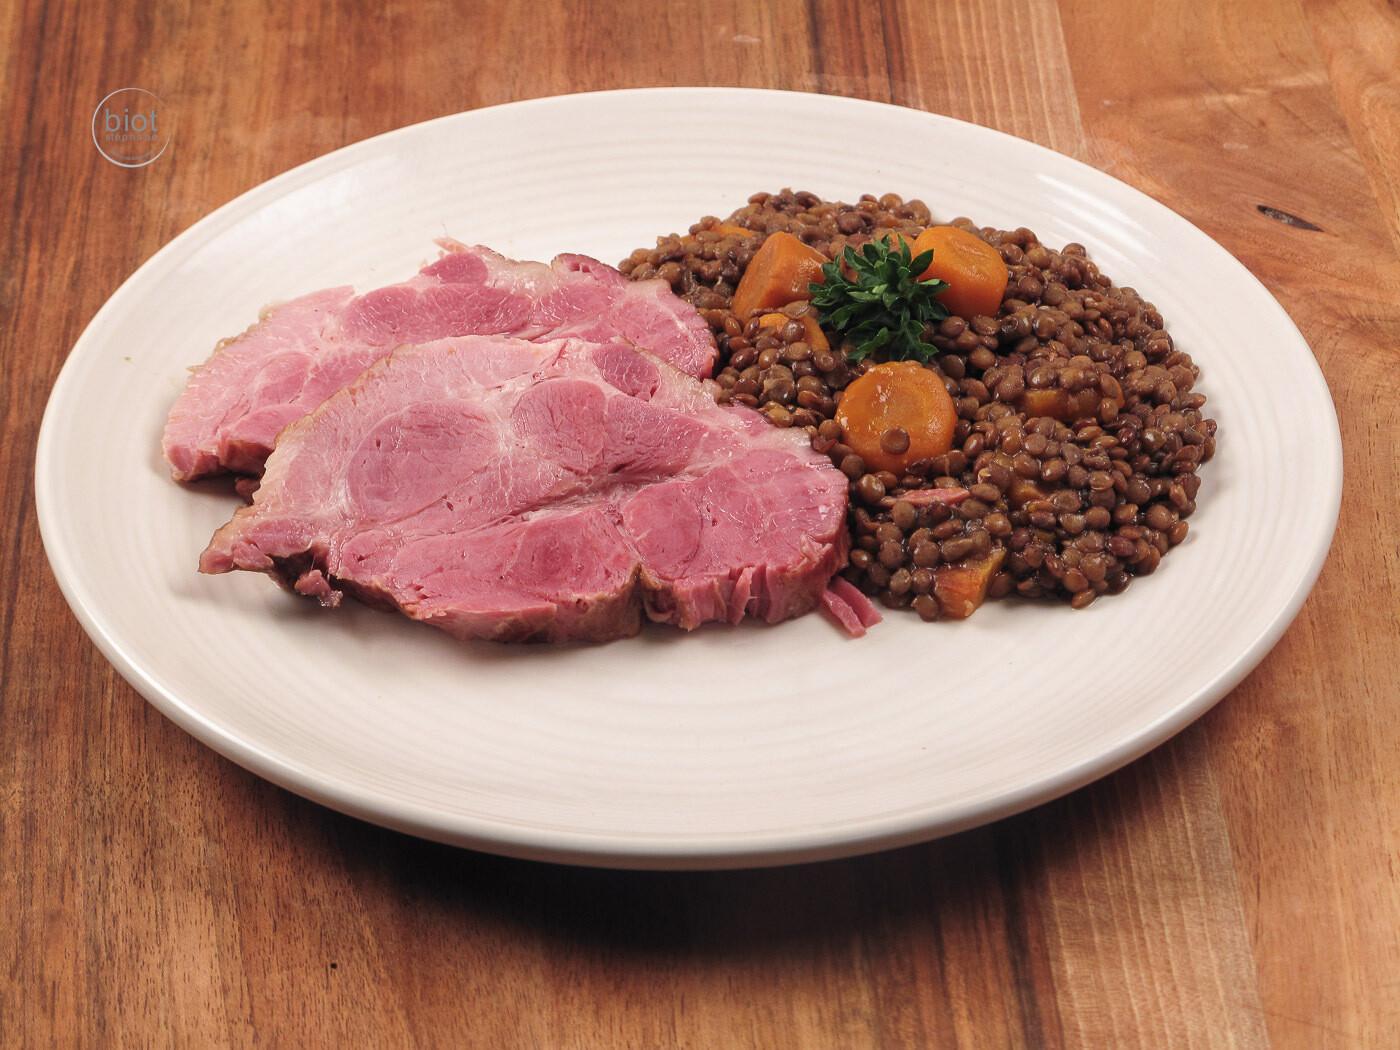 Cured pork cushion meat - Petit Salé - 1 lb.